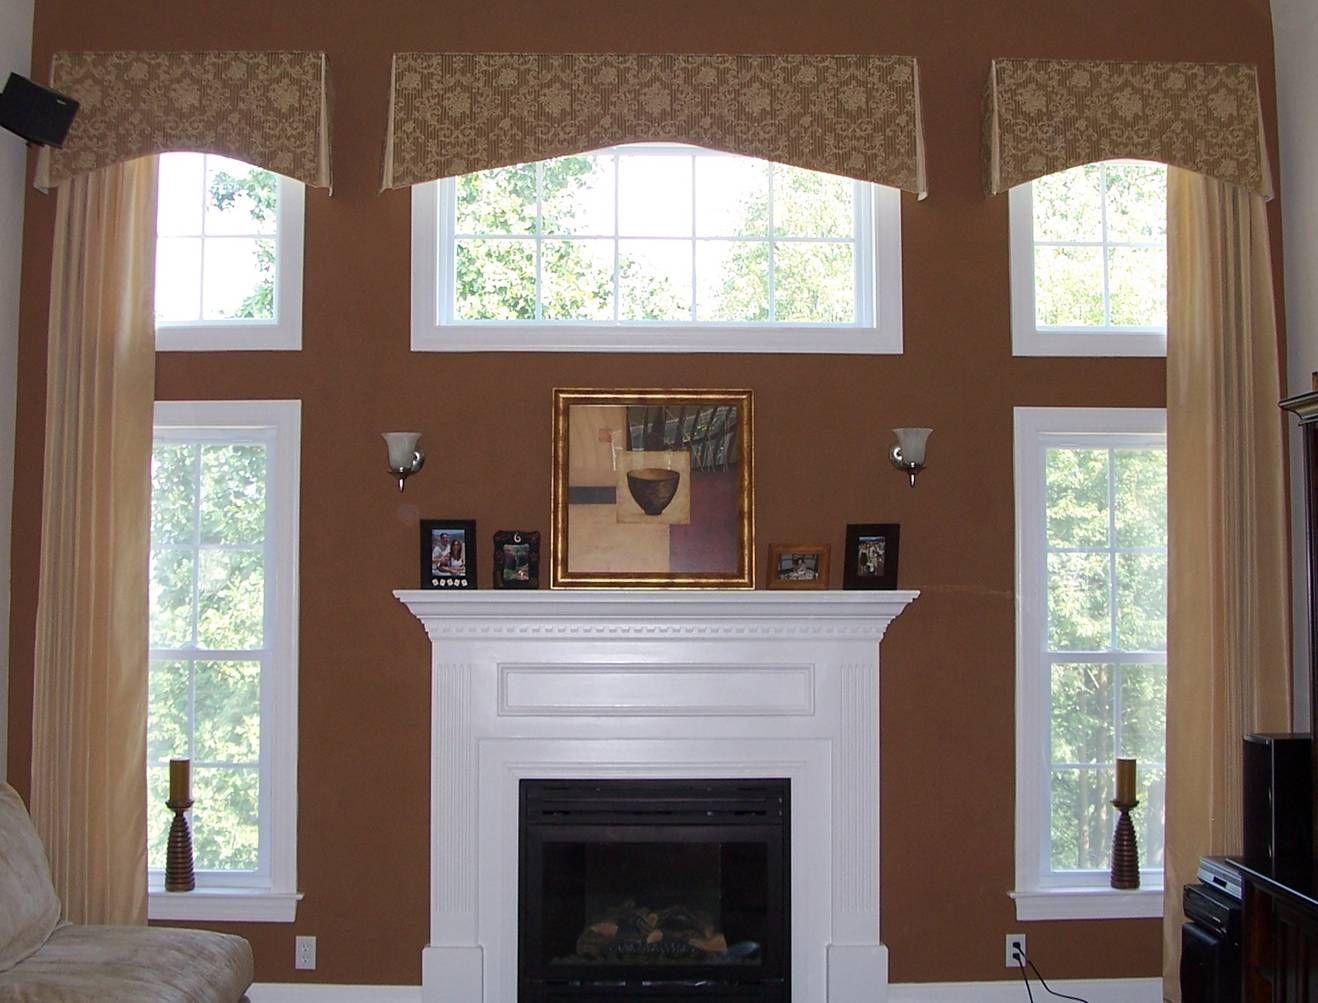 Shade Tree Interiors - handling 2 story windows with ...